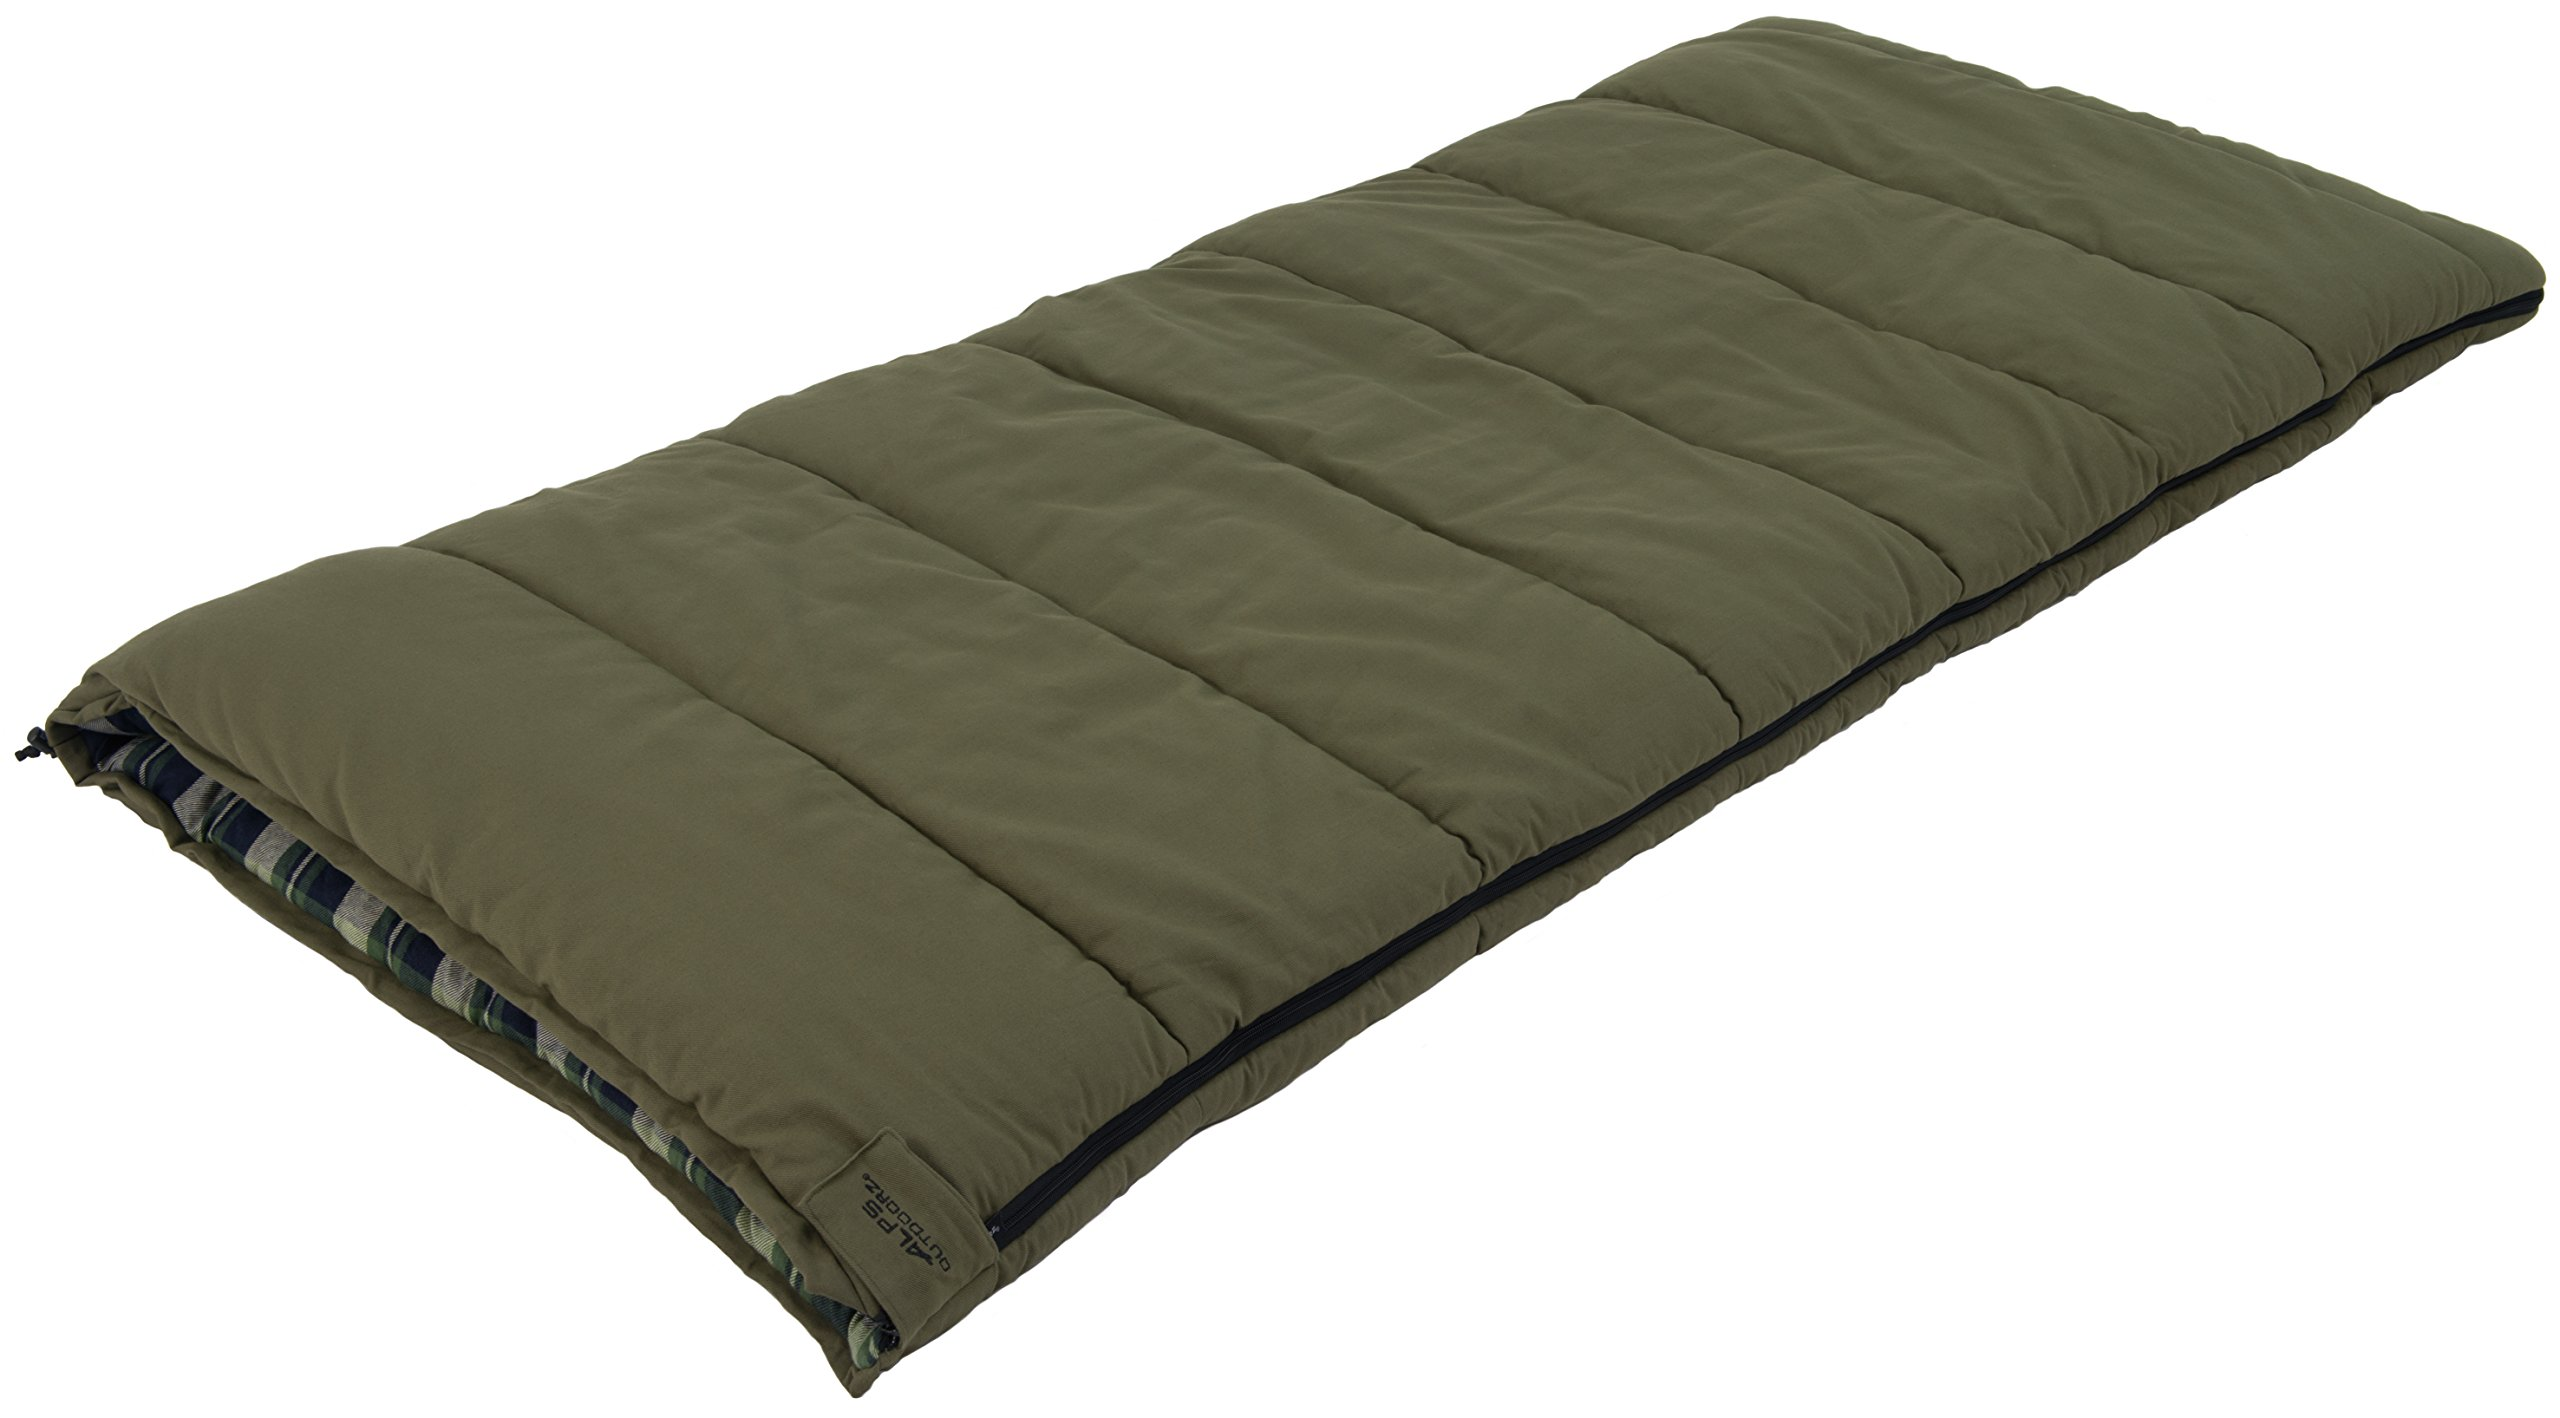 ALPS OutdoorZ Redwood -10 Degree Flannel Sleeping Bag 4